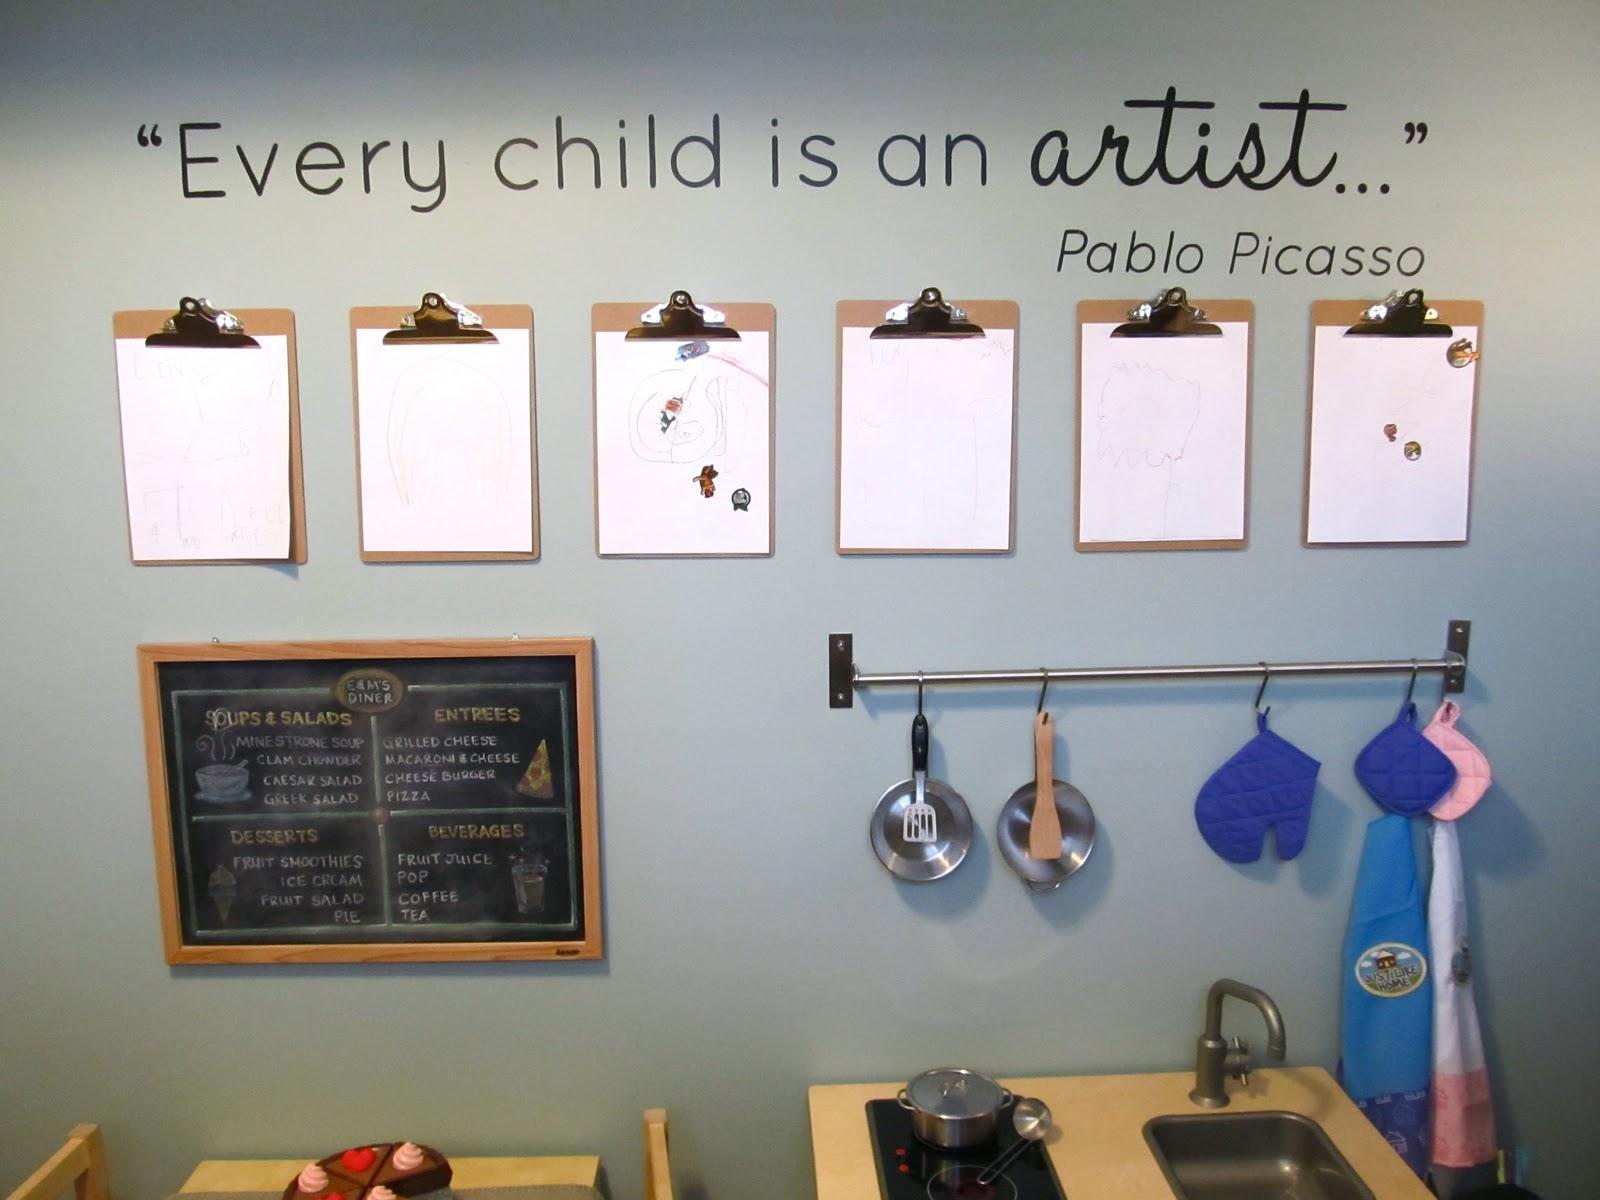 Wall Art Ideas For Playroom | Wallartideas In Playroom Wall Art (Image 17 of 20)